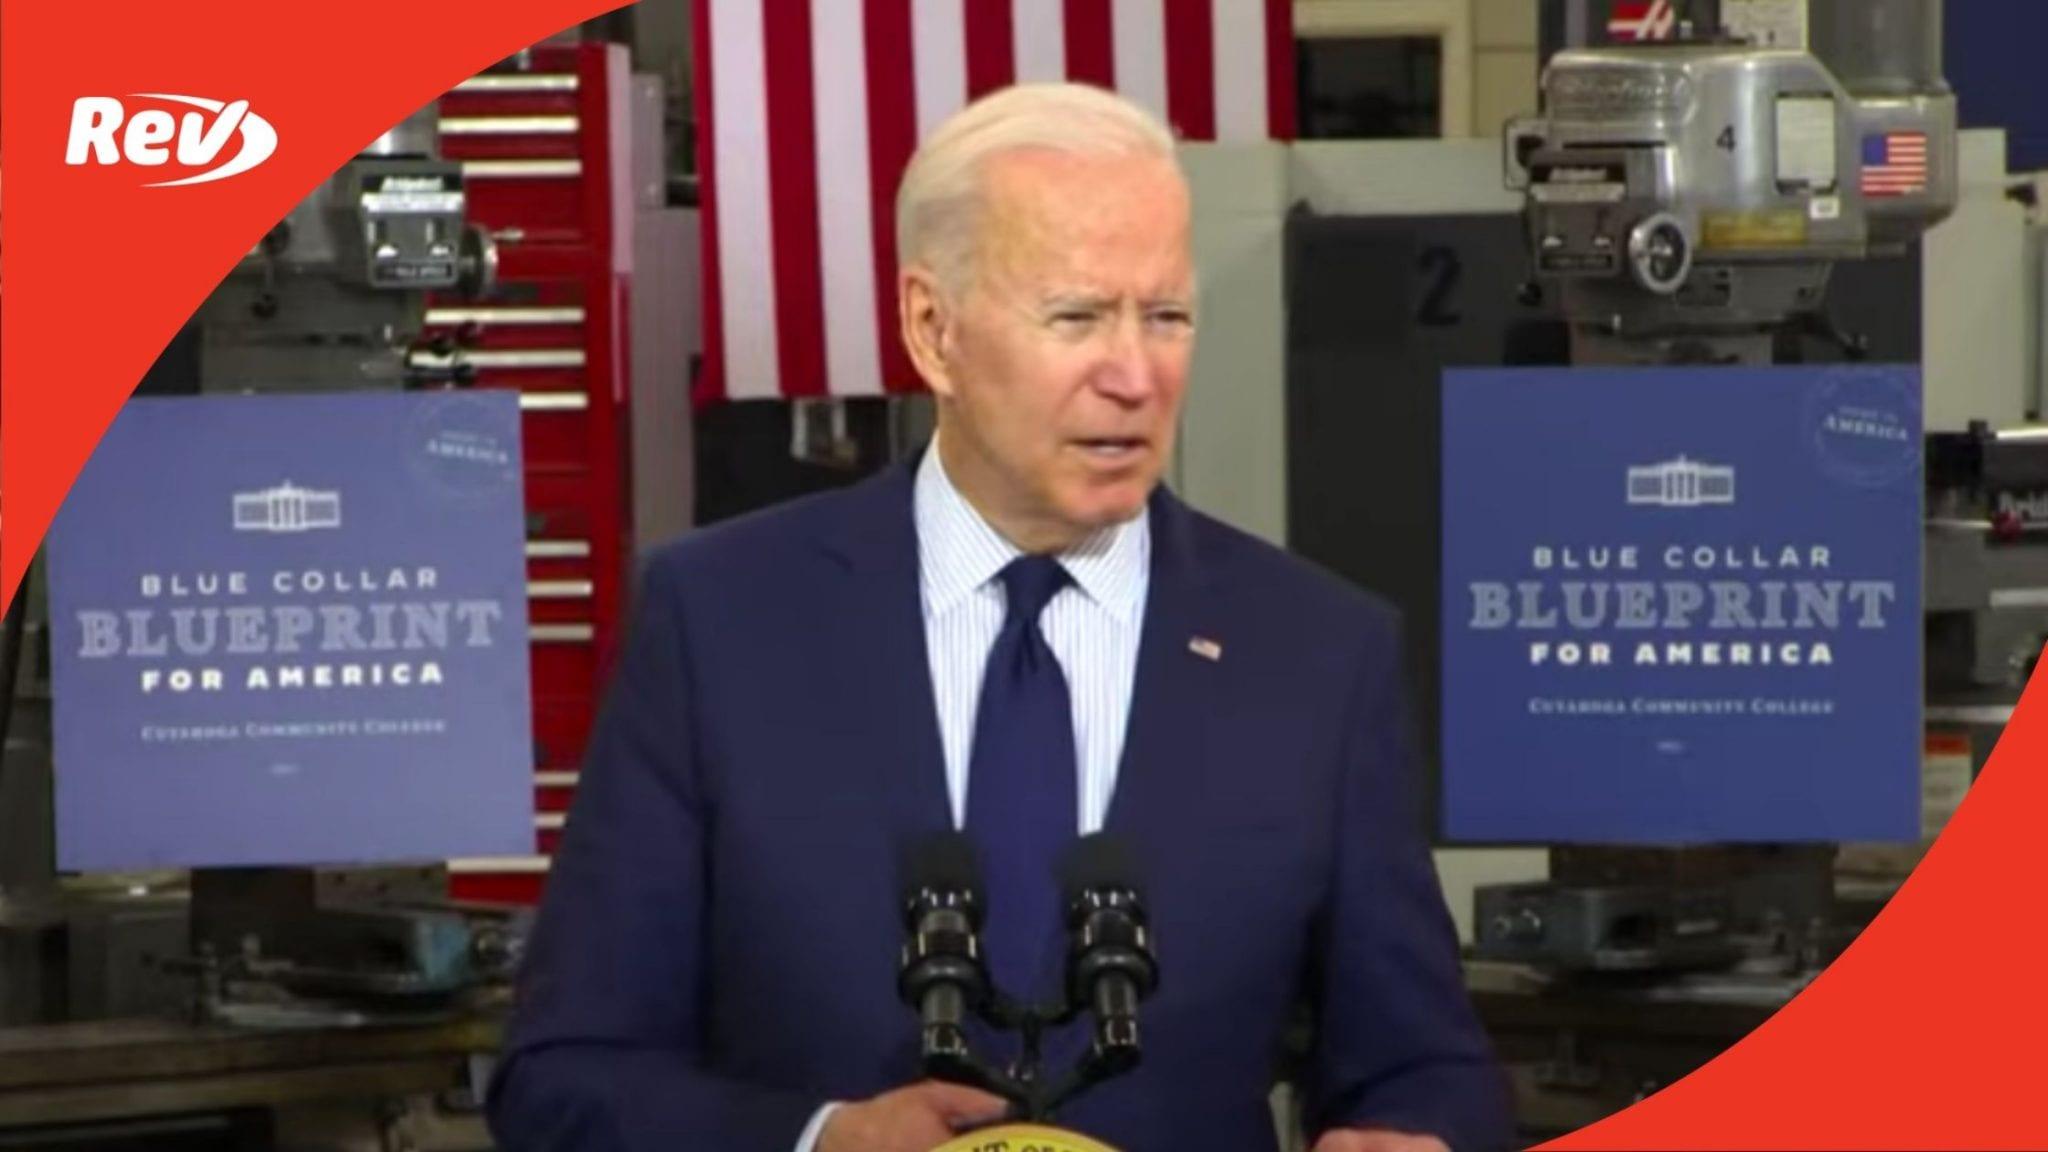 Joe Biden Cleveland Speech Transcript May 27: Economy, Infrastructure